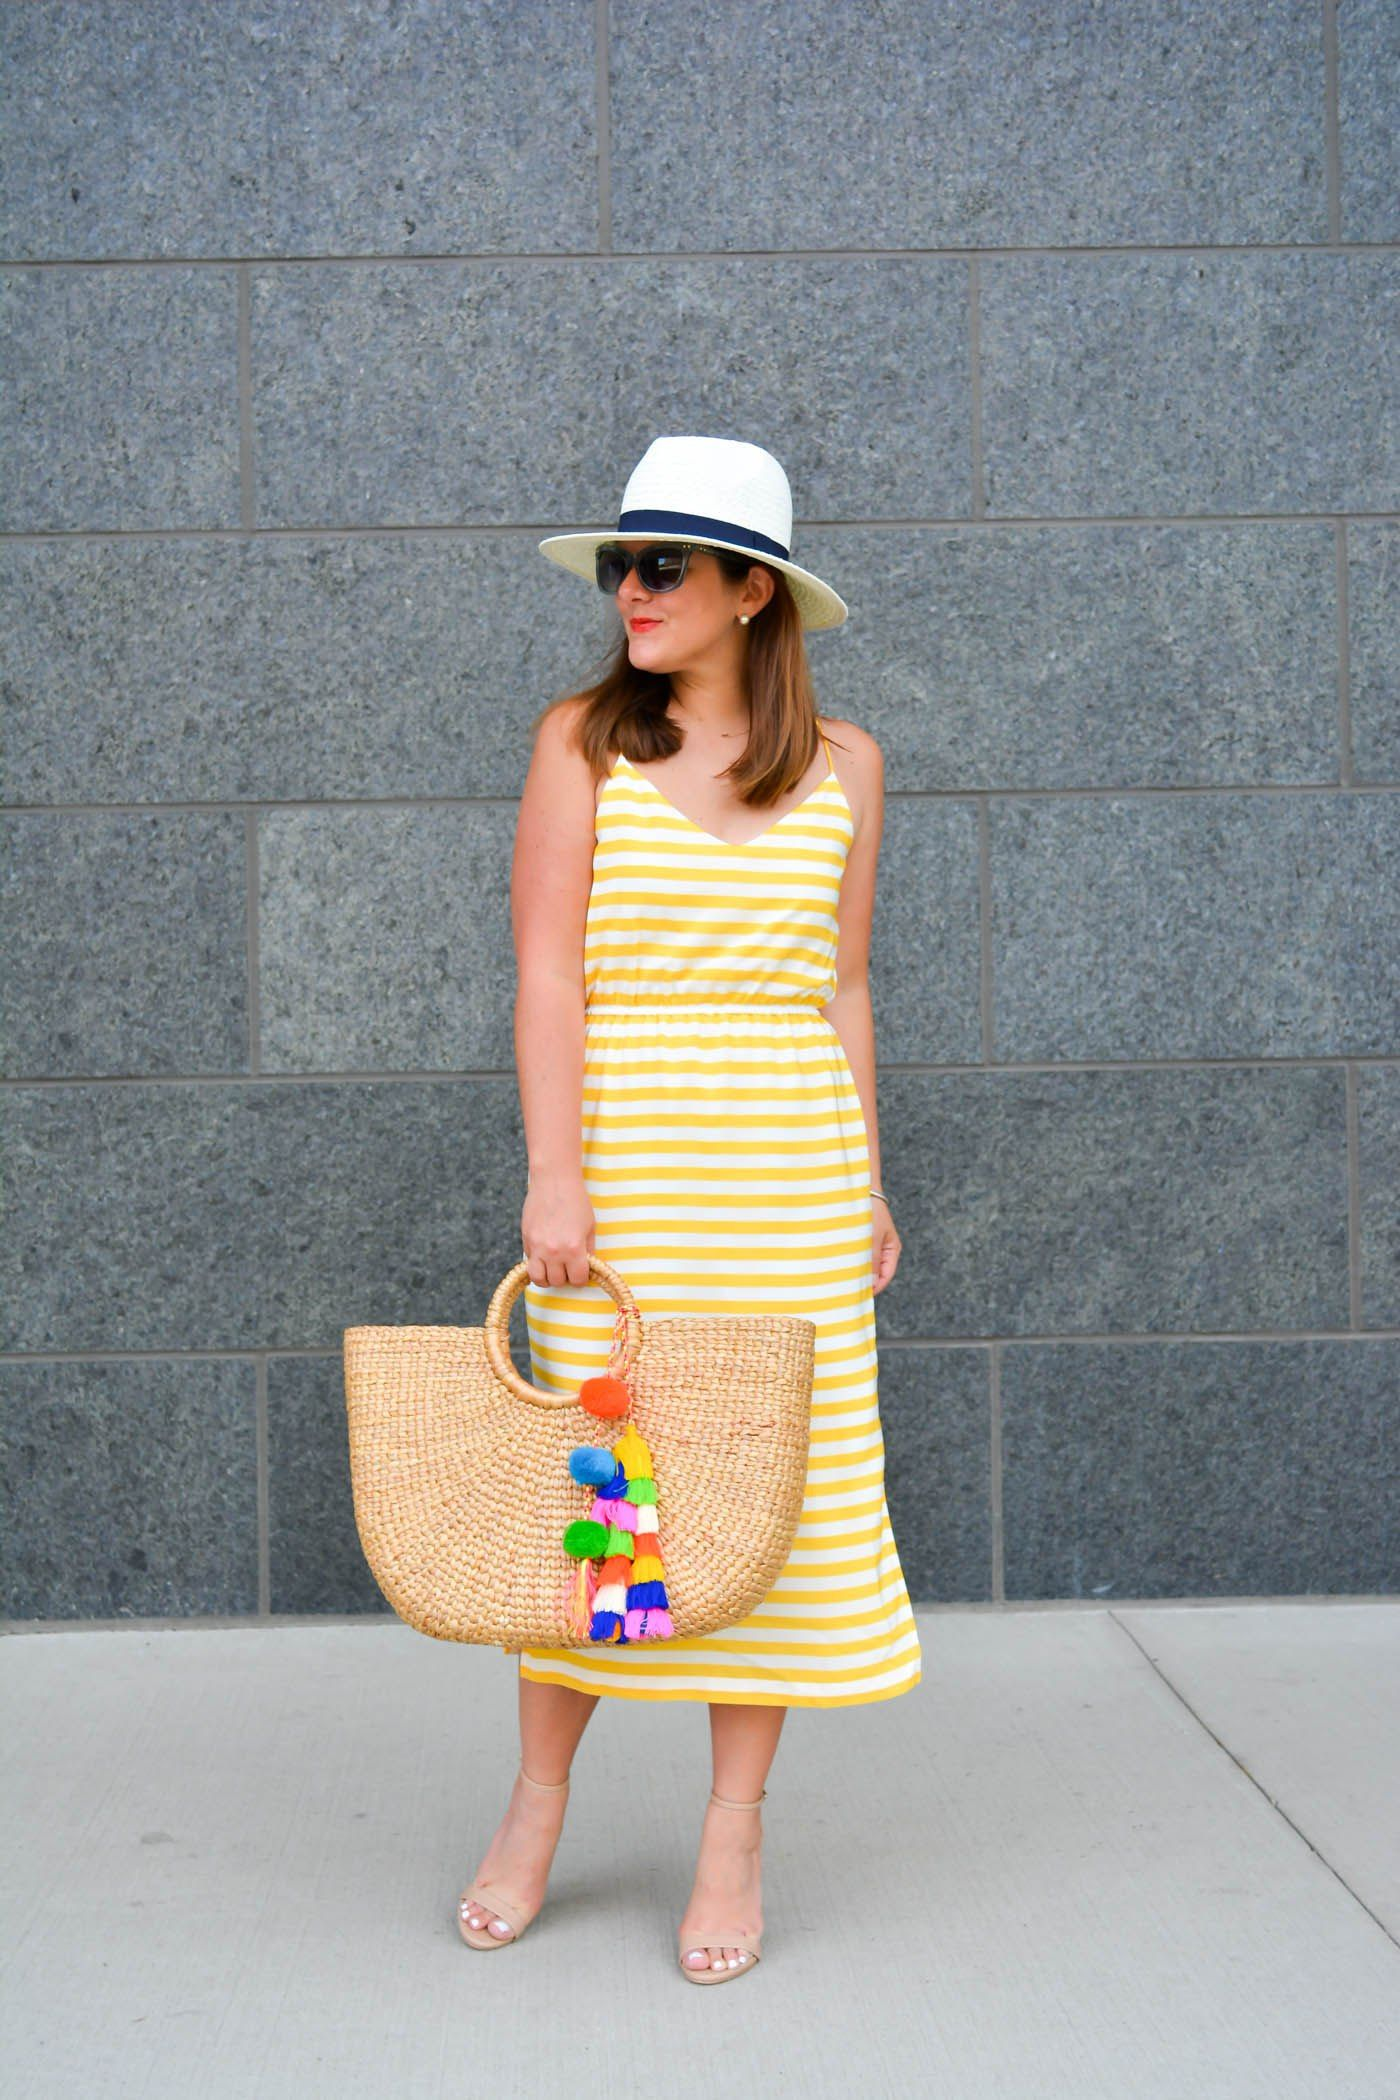 02aeb662c6f5 Summer Style, Chicago Blogger, Tassel Pom-Pom Beach Basket, J.Crew Carrie  Dress in Stripe, Stripe Midi Dress